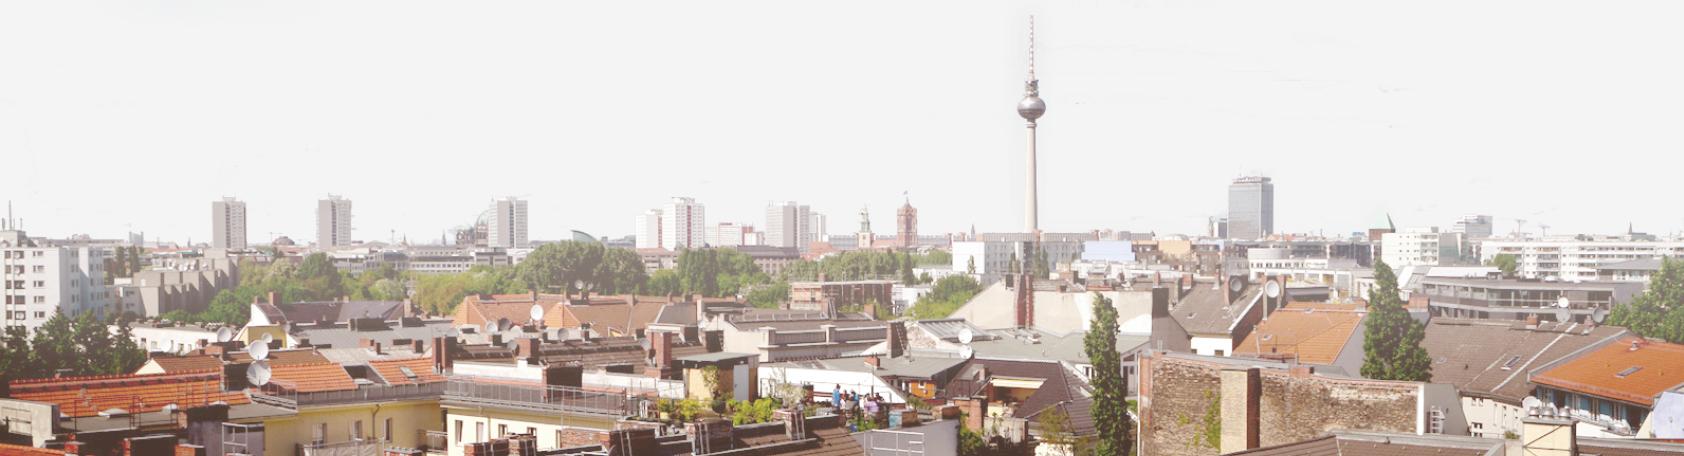 BerlinSkyline6